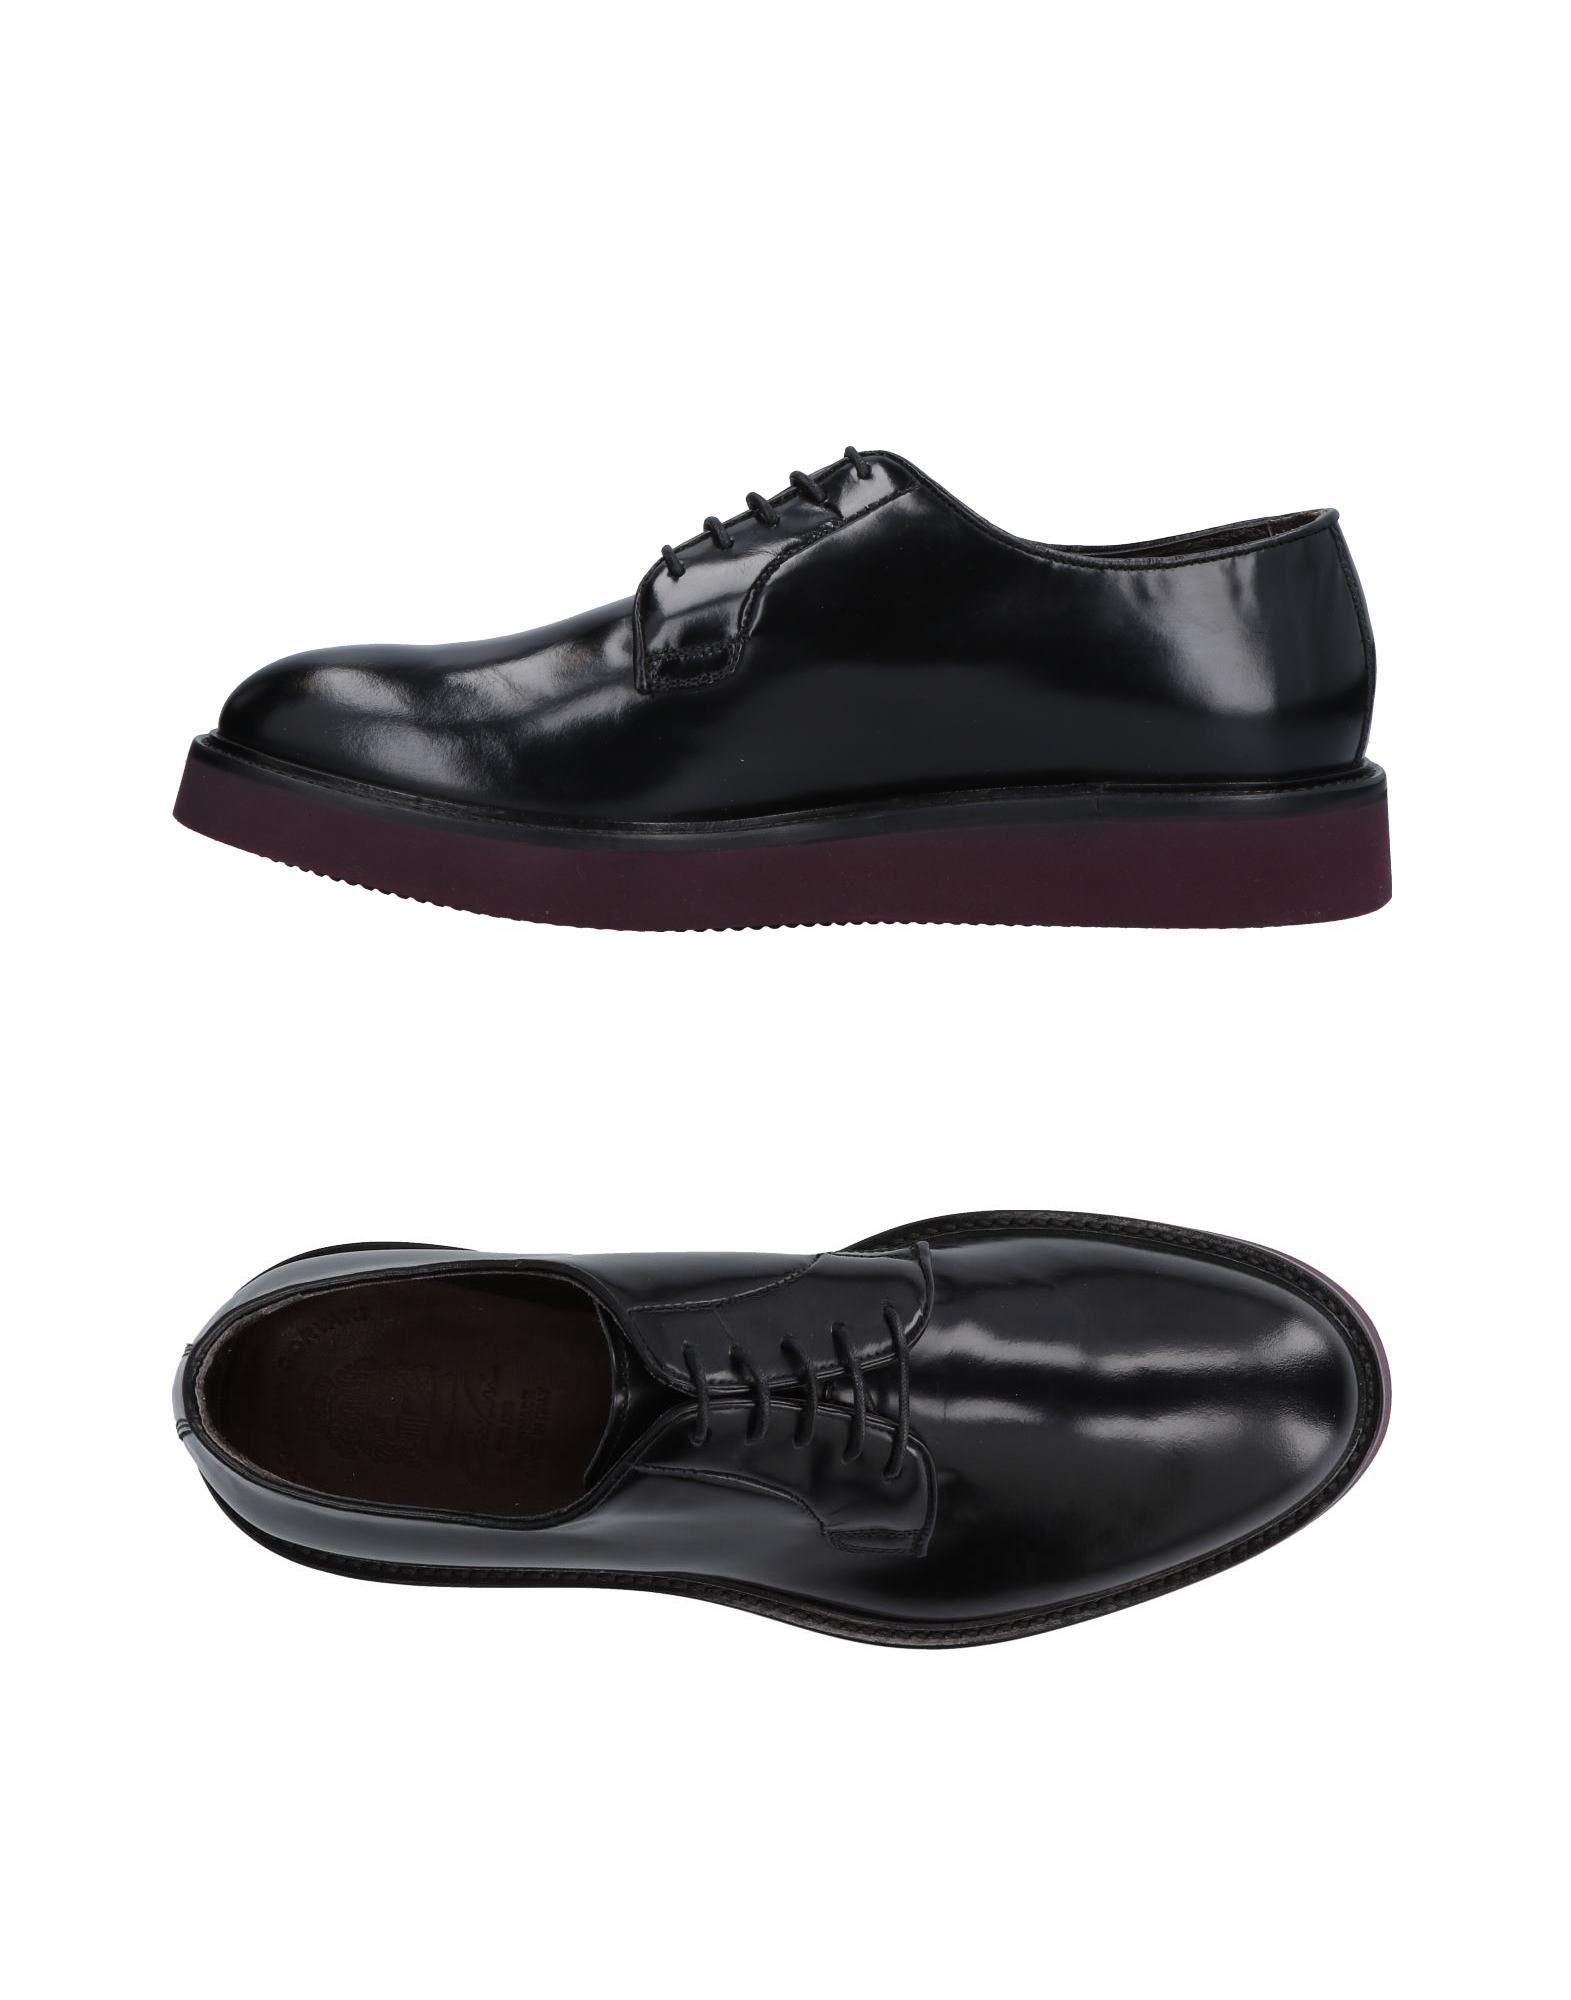 Corvari Gute Schnürschuhe Herren  11487926XN Gute Corvari Qualität beliebte Schuhe 2488ac